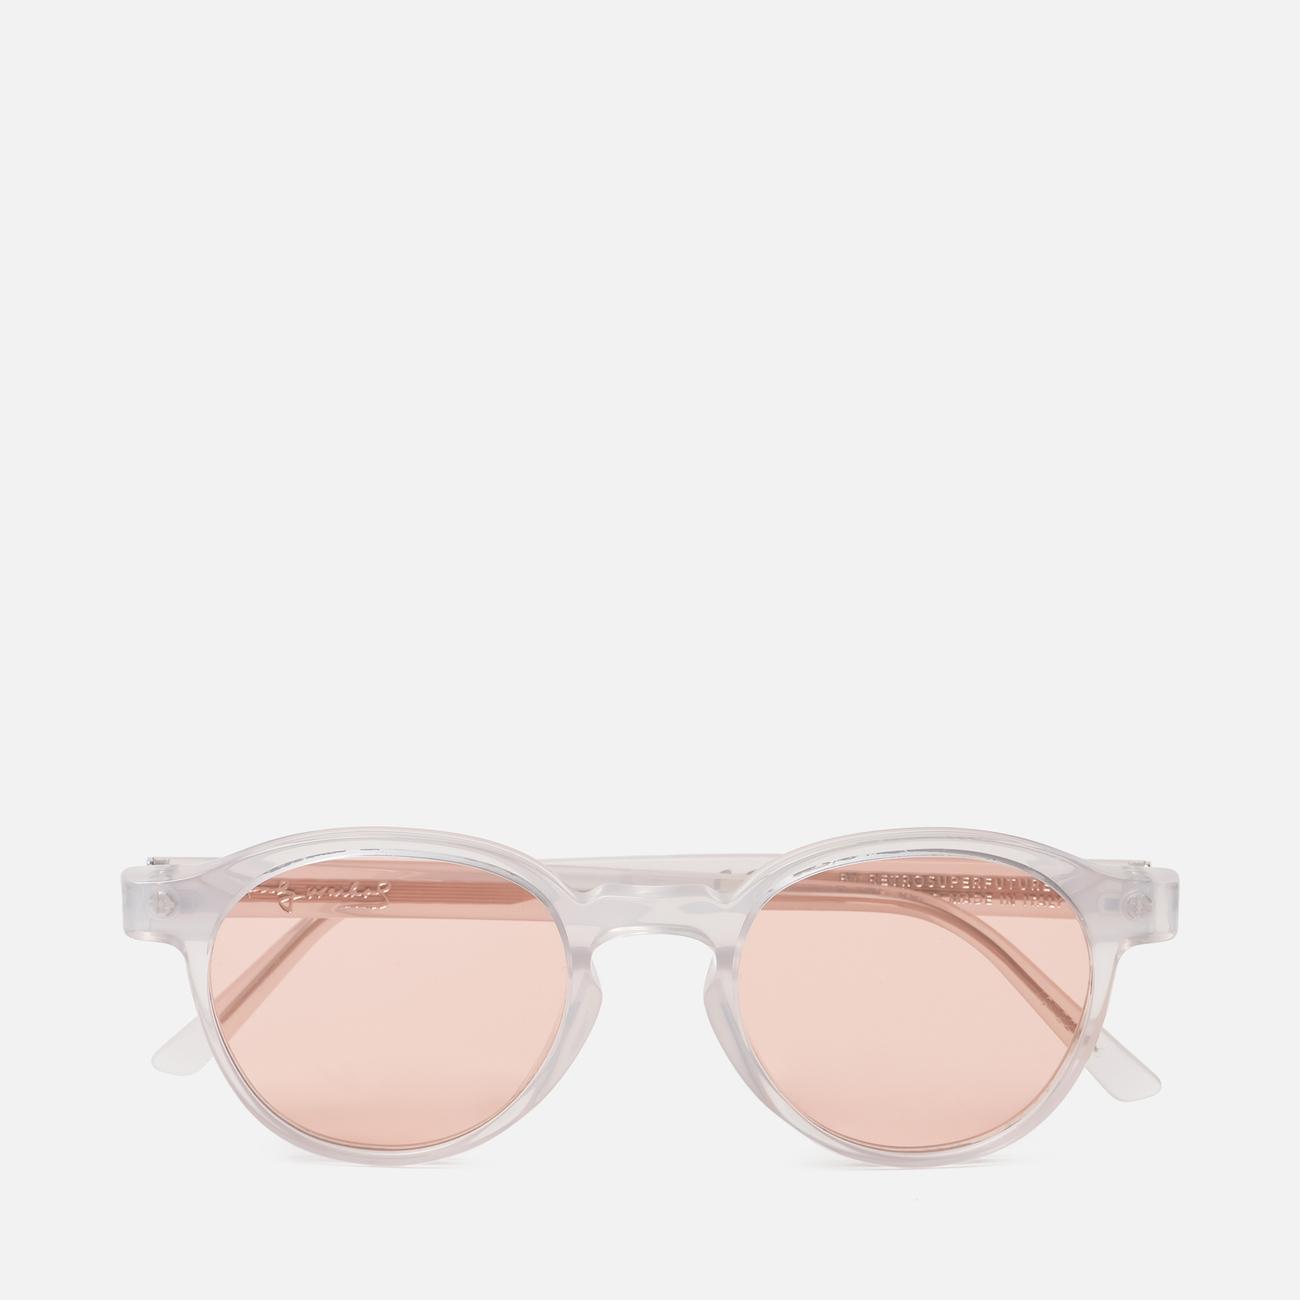 Солнцезащитные очки RETROSUPERFUTURE x Andy Warhol The Iconic Series 49 Crystal Grey